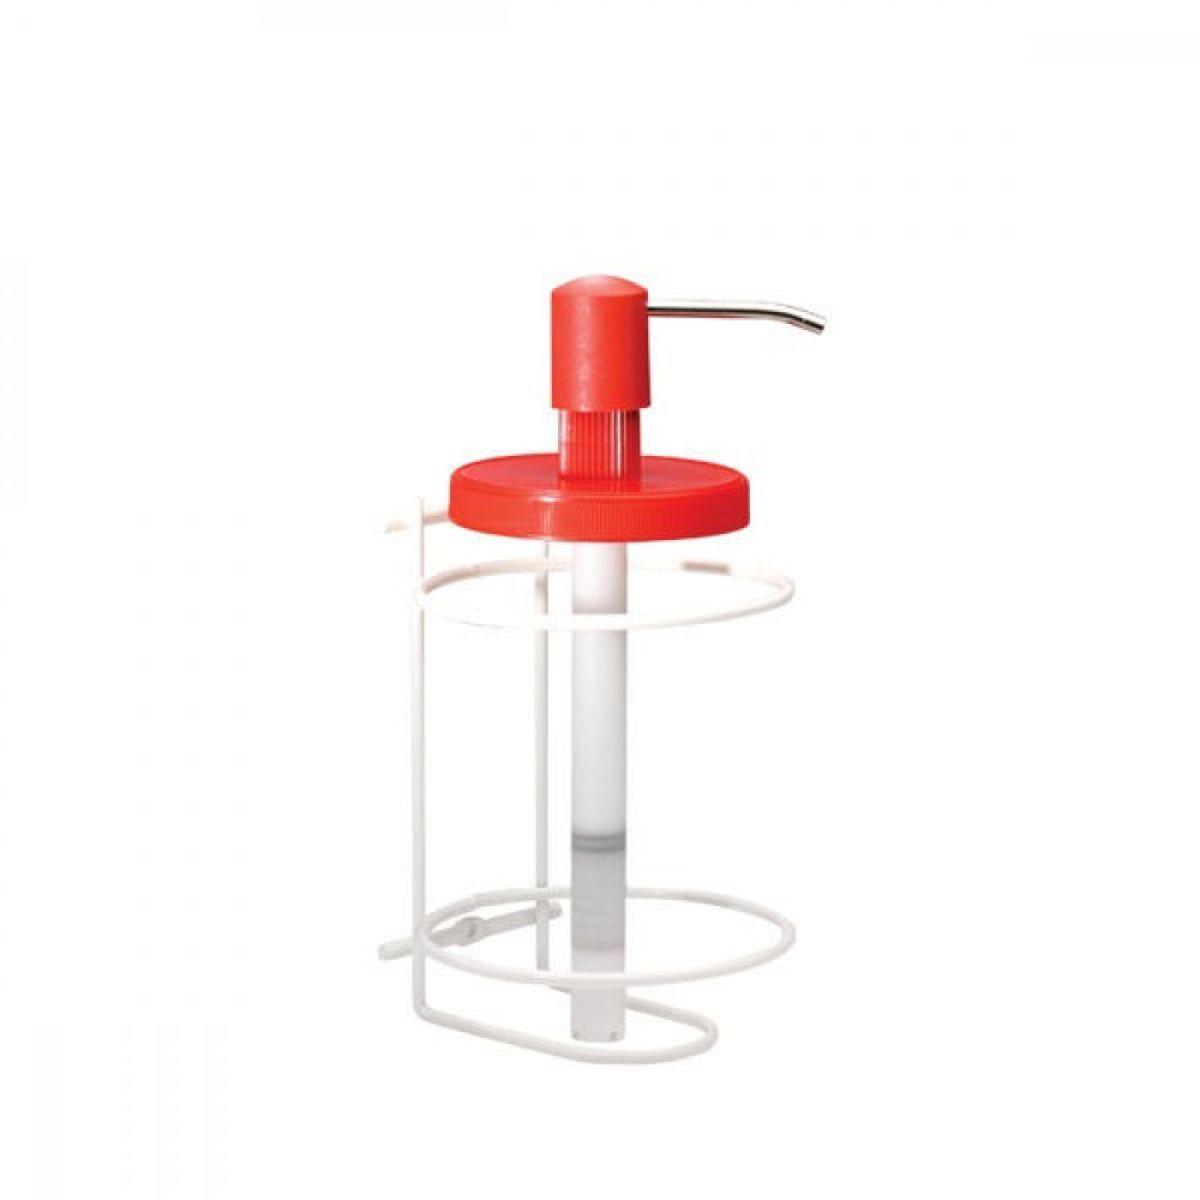 Wandhouder / dispenser 3l. handreiniger